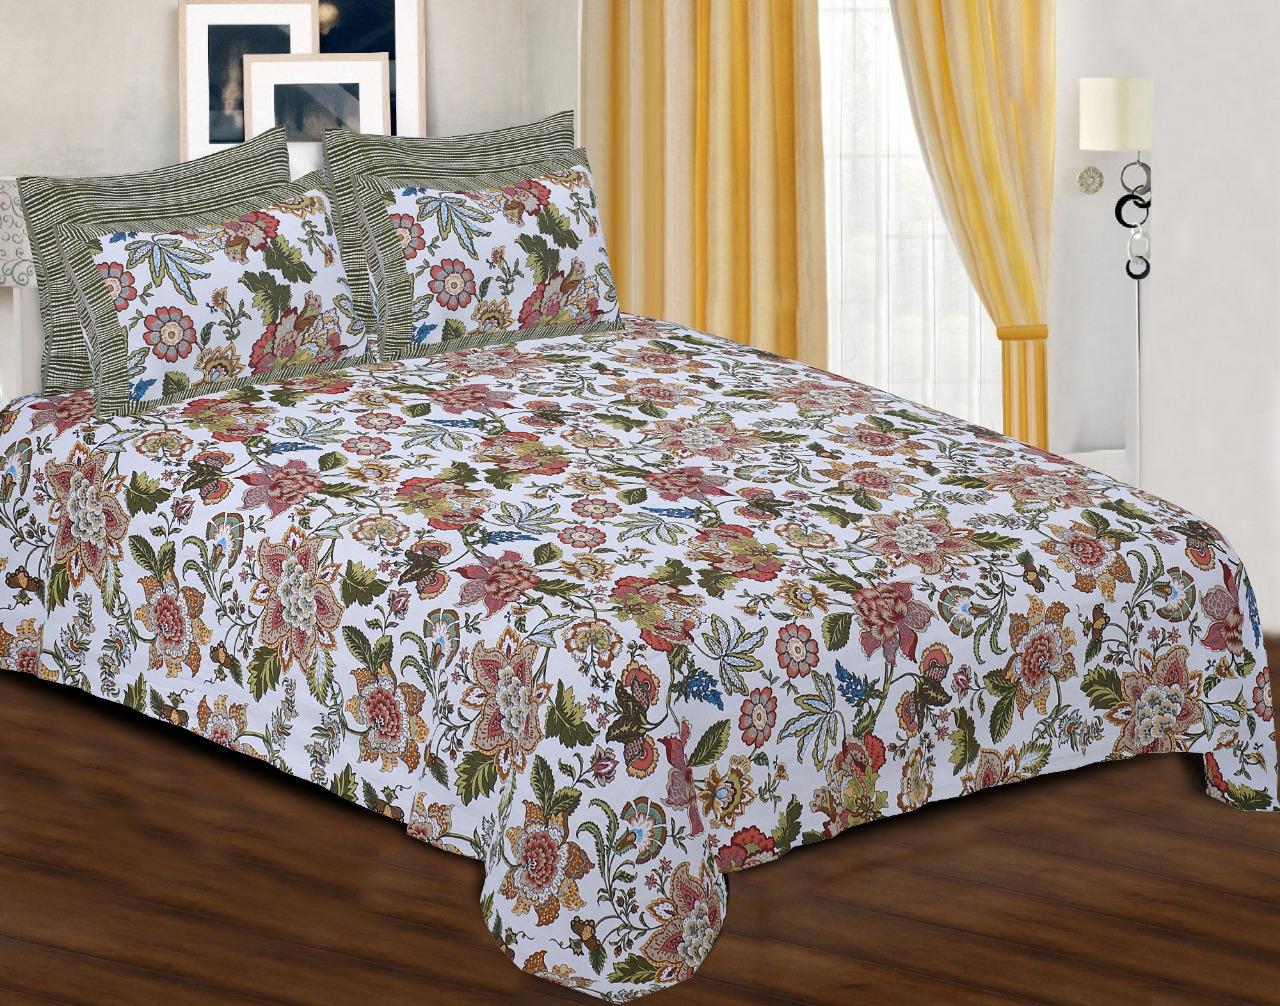 Pinkblock.in   Snowy Cotton Printed Bedsheet